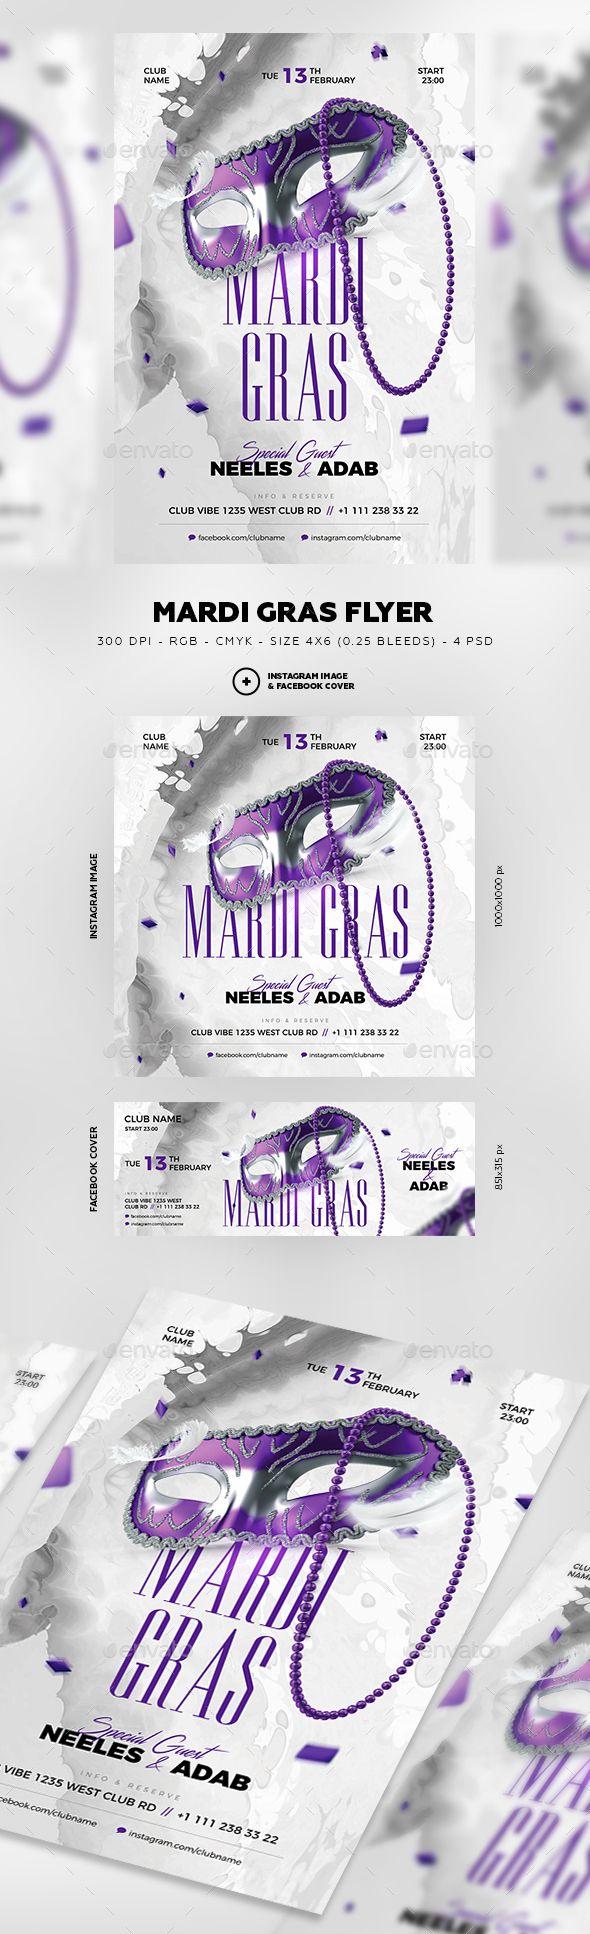 Mardi Gras Carnival Flyer #Costumes #facebook • Download ➝ https://graphicriver.net/item/mardi-gras-carnival-flyer/21318869?ref=pxcr